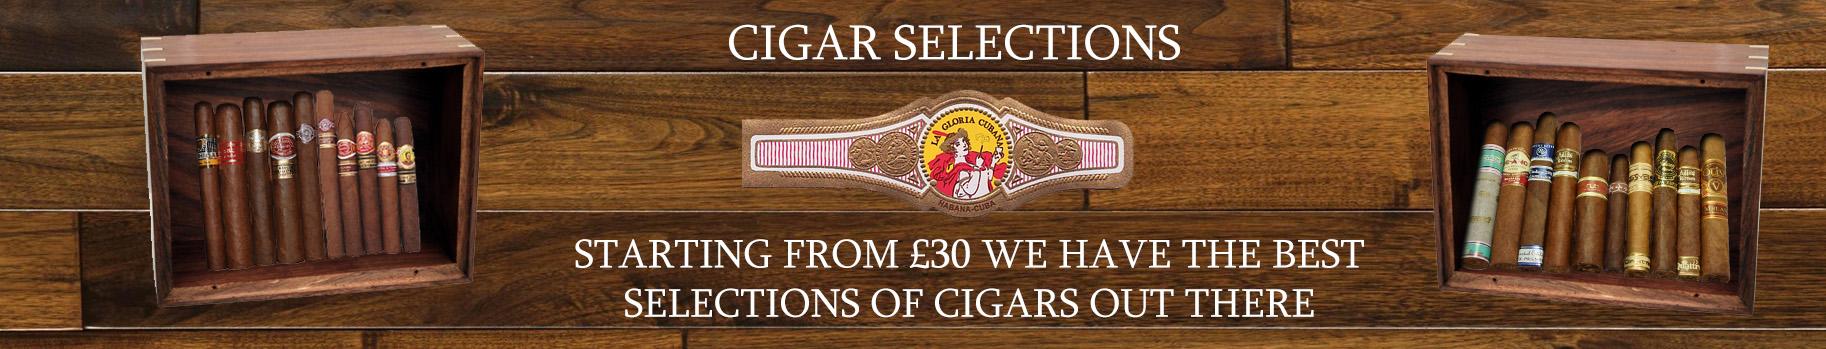 cigarselection1